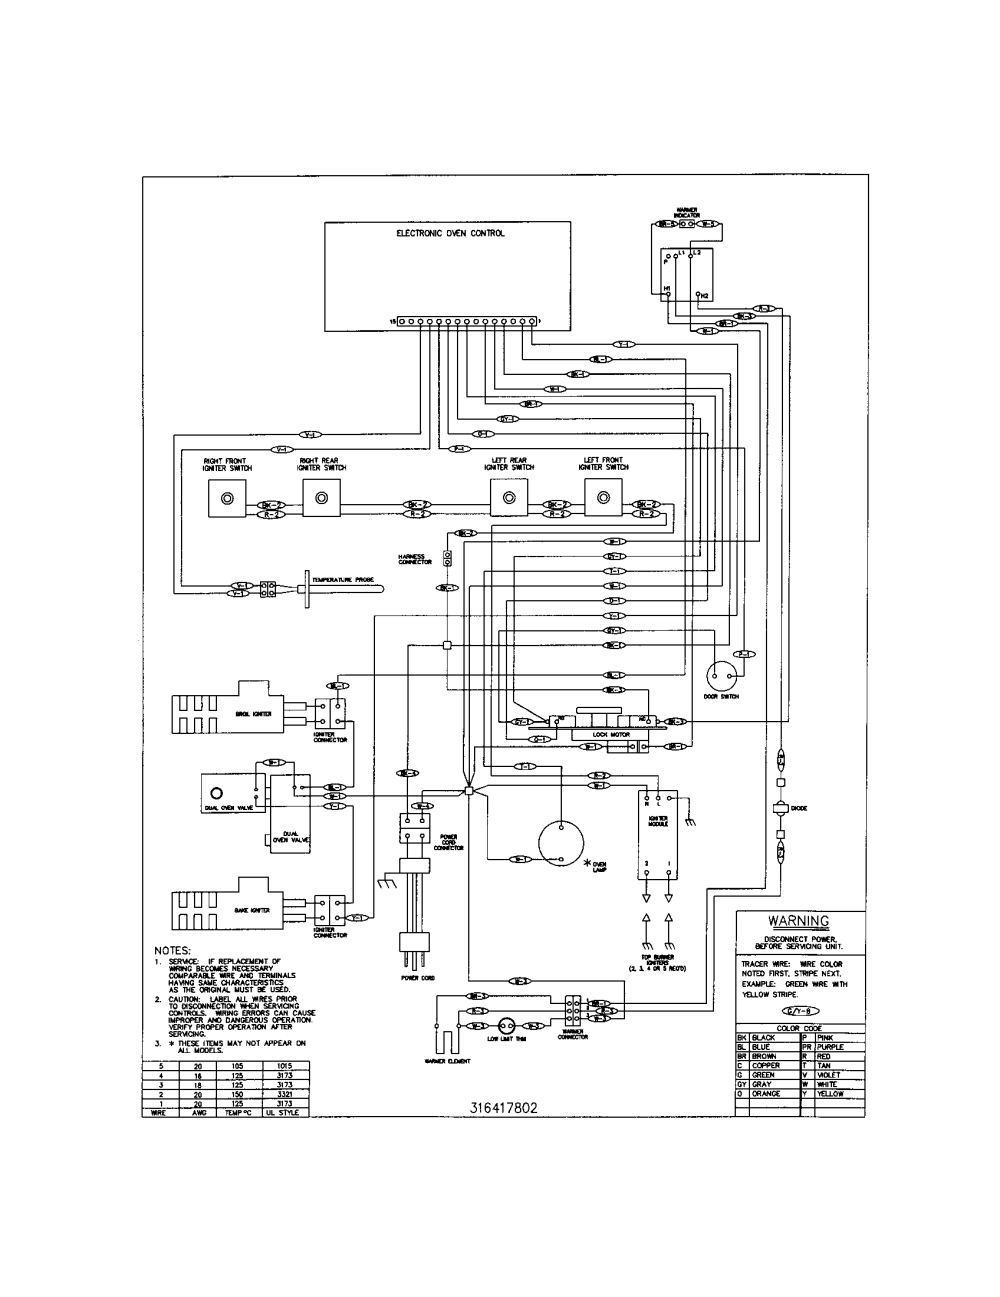 medium resolution of kenmore 79078672400 wiring diagram diagram